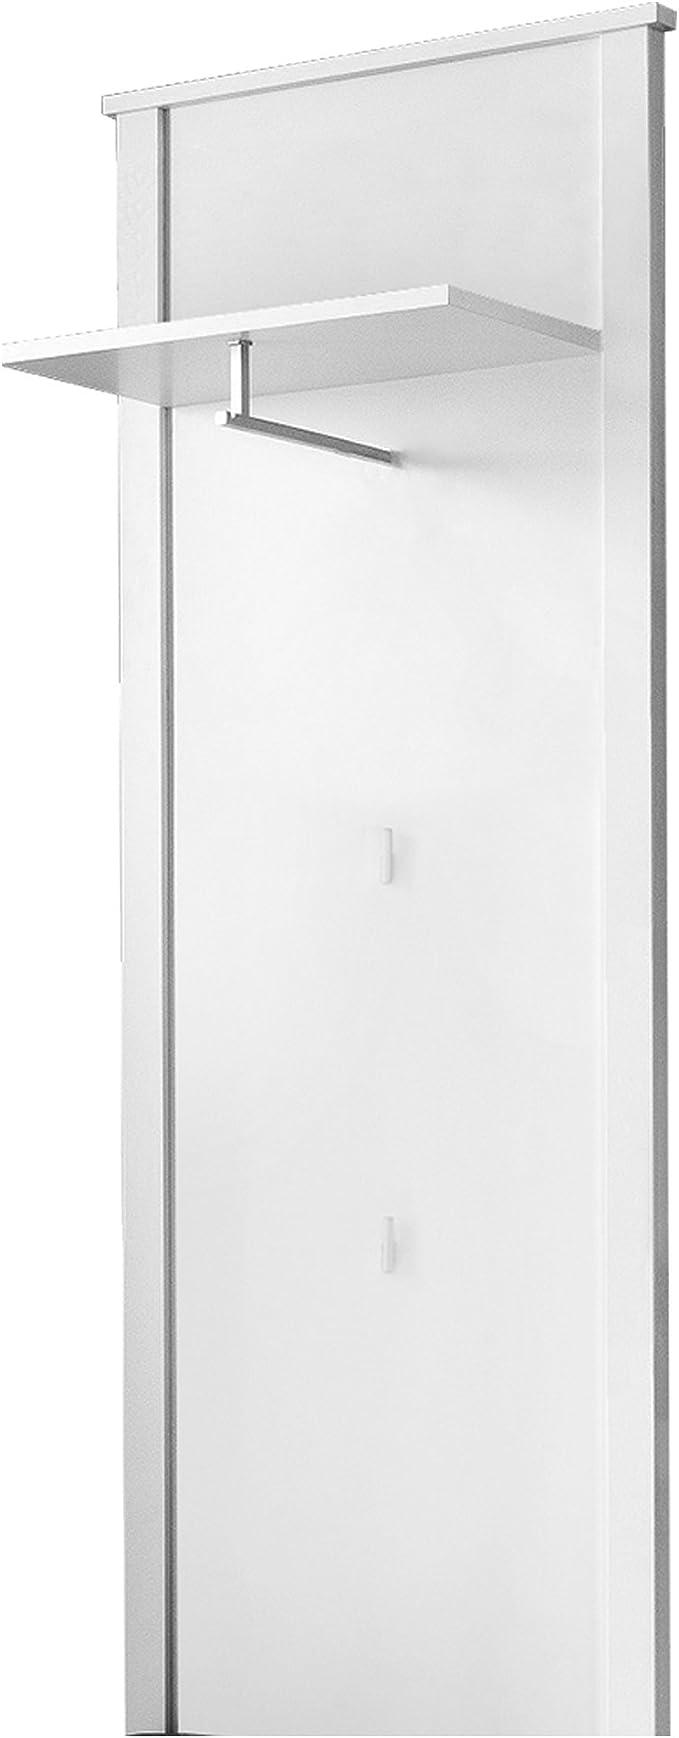 Trendteam Muebles Armario panel , Madera, Blanco, 55 x 147 x 26 cm ...